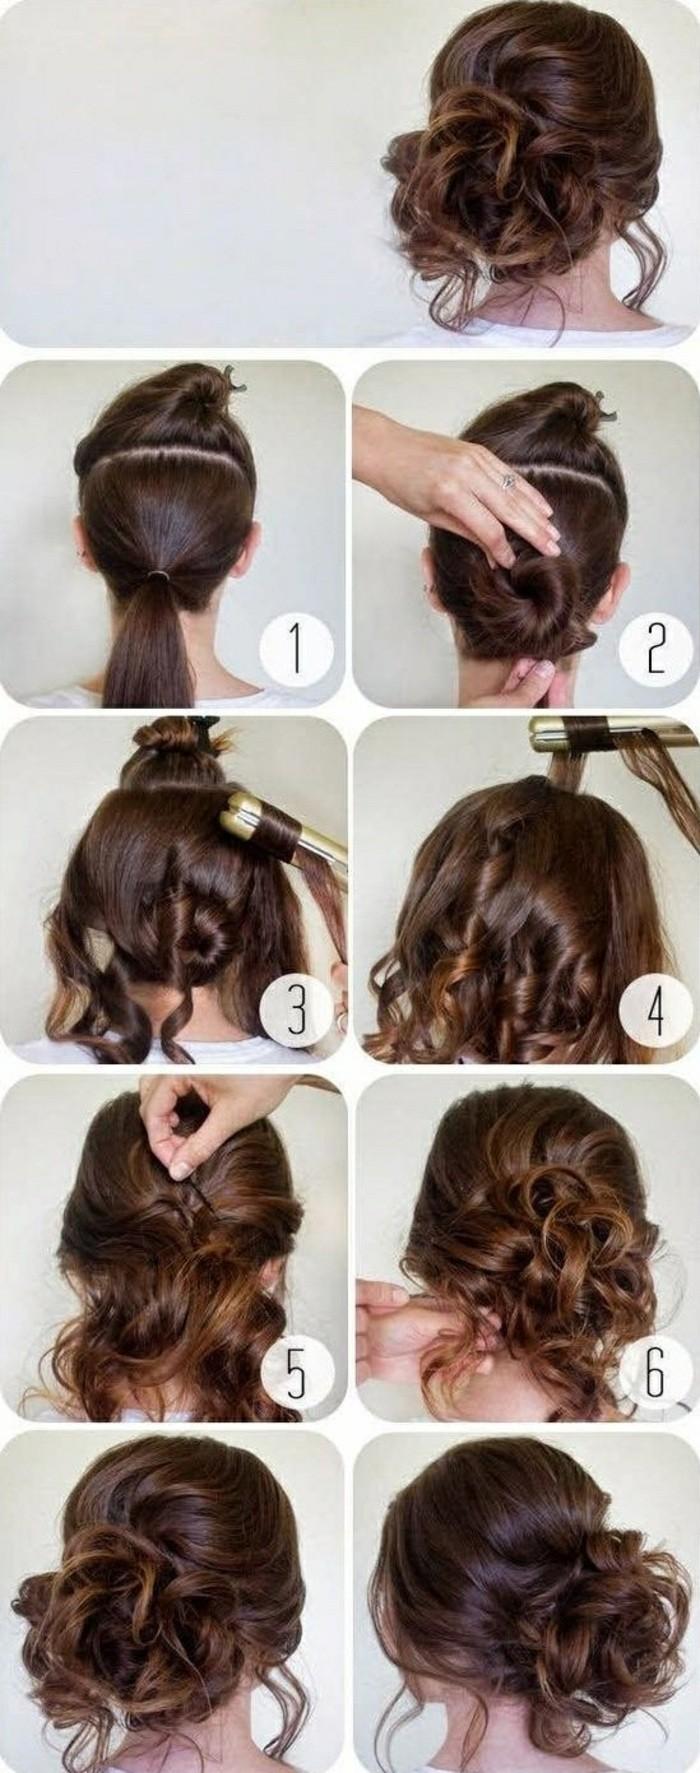 peinados faciles media melena, peinados pelo rizado, ideas de peinados de novia bonitos paso a paso